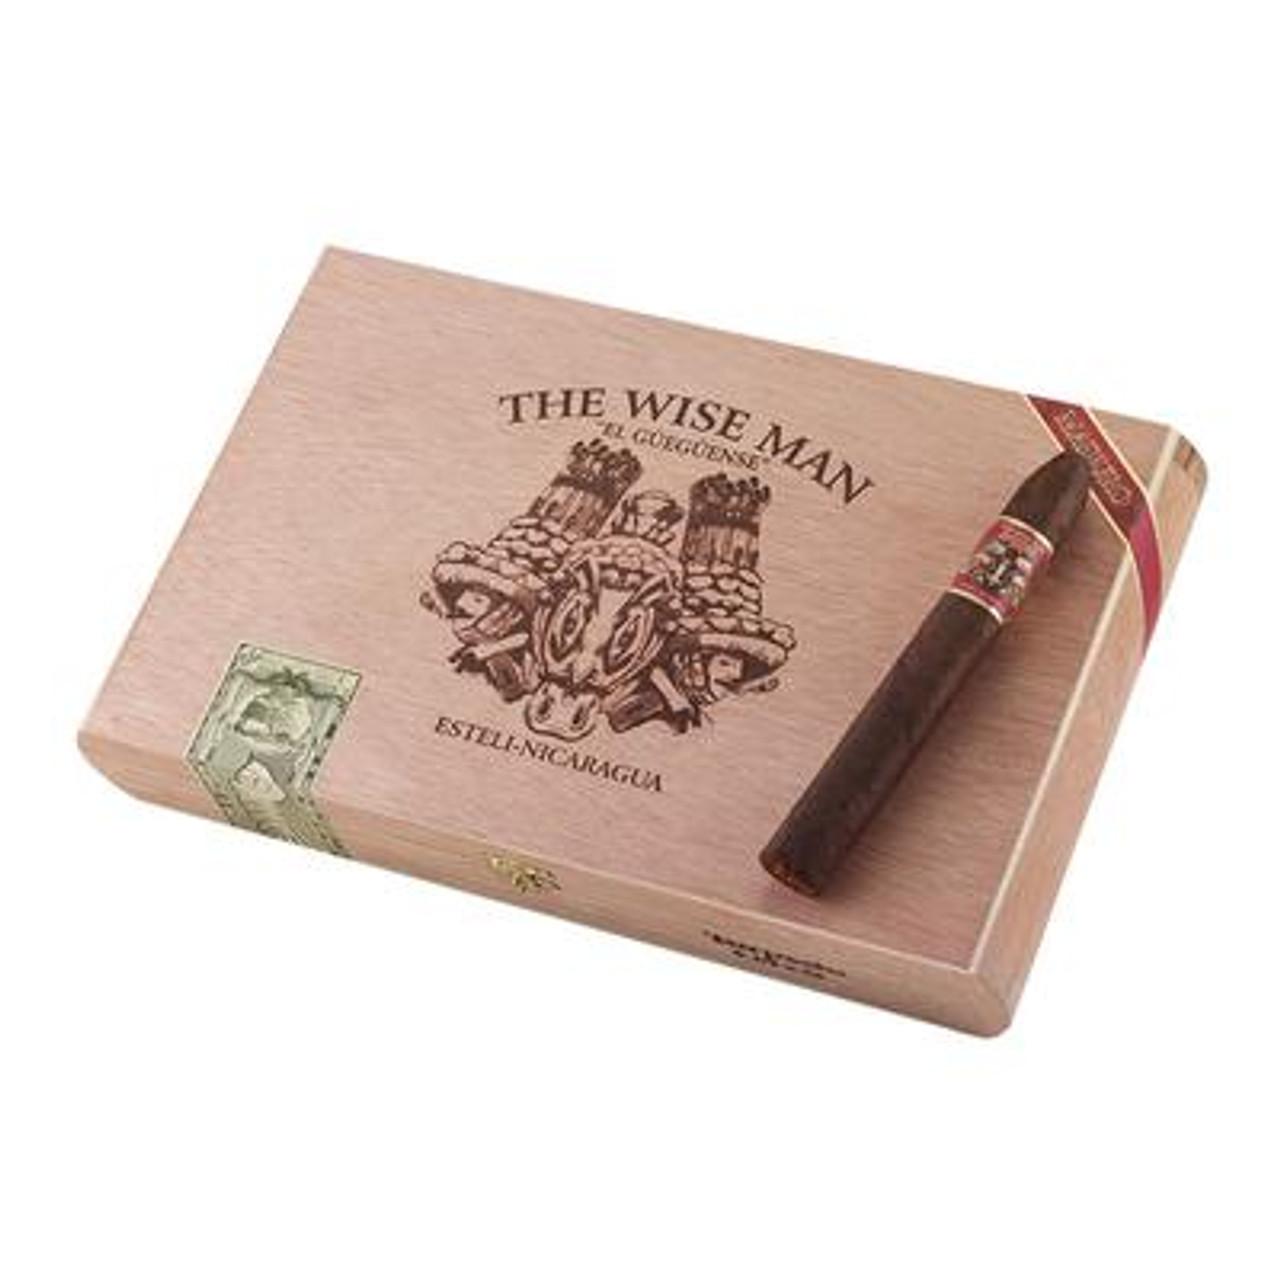 Foundation The Wise Man Maduro Torpedo Cigars - 6.25 x 52 (Box of 25)